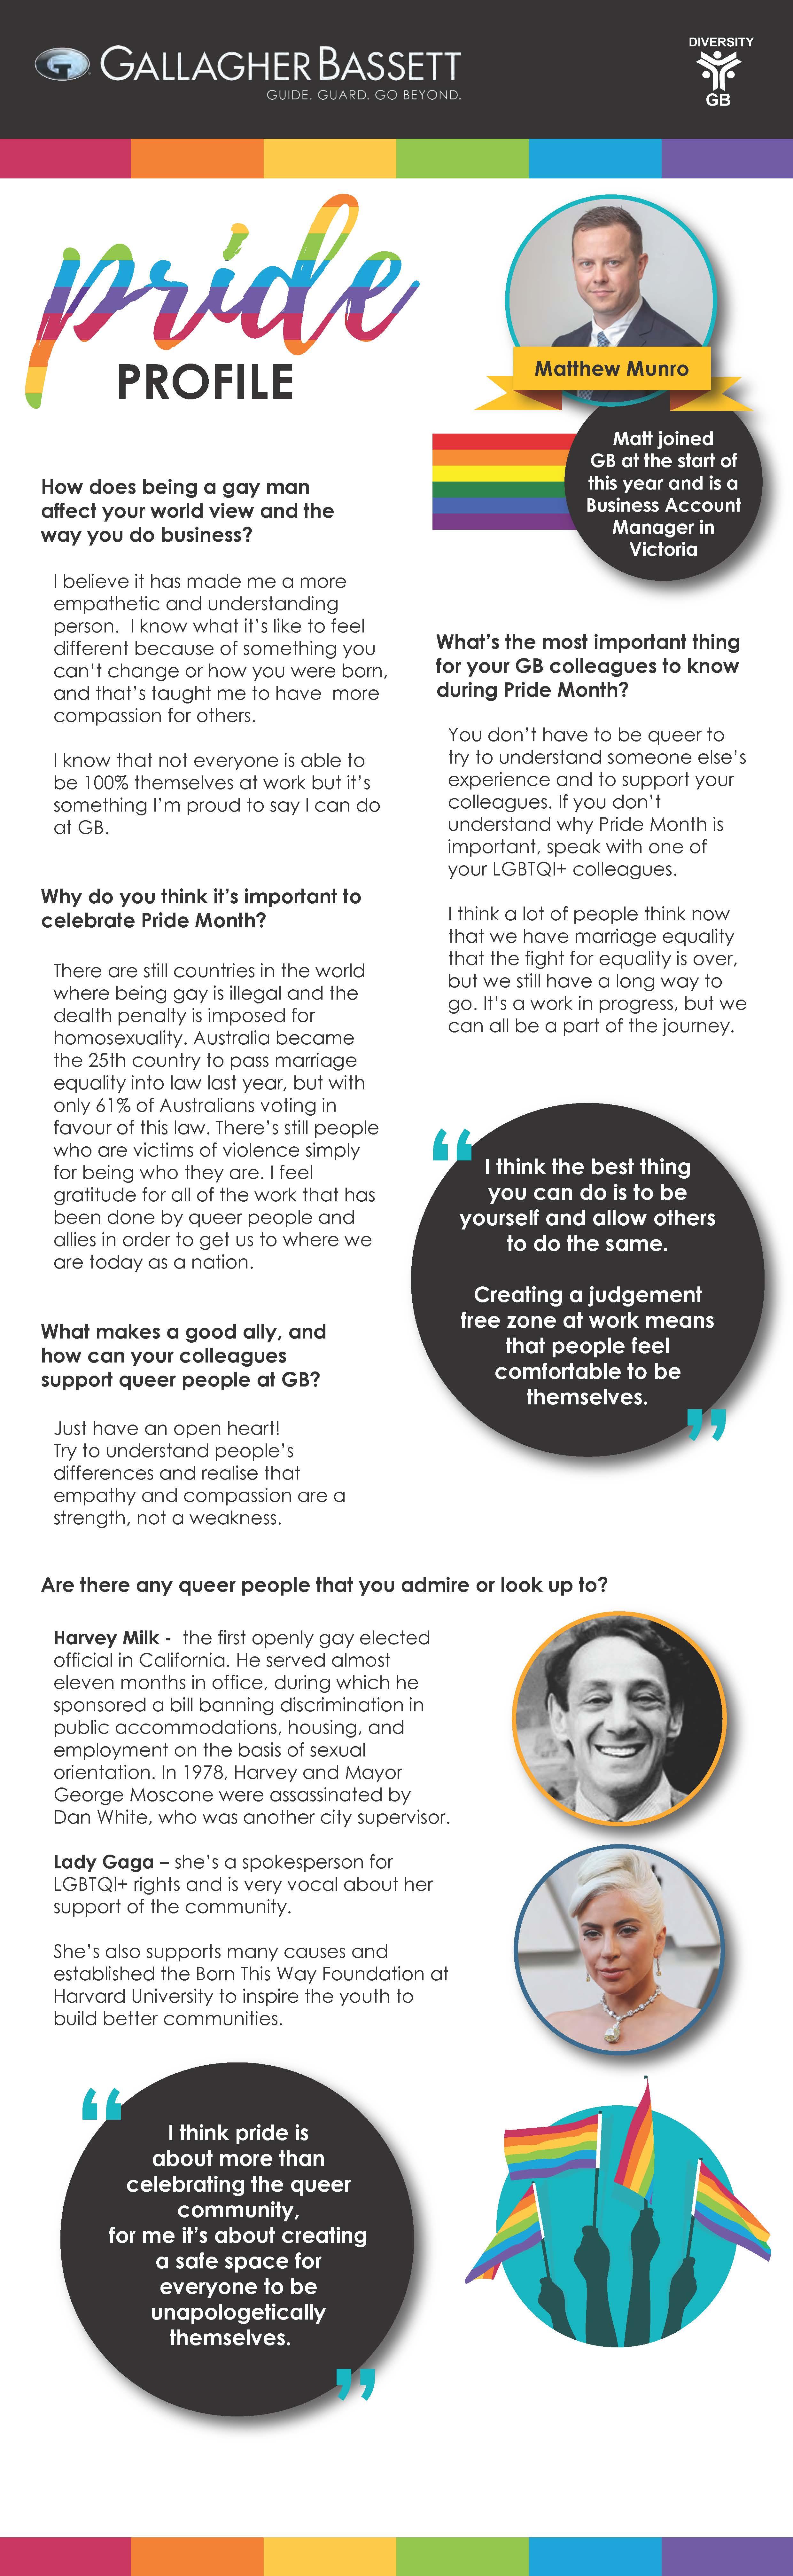 Pride Profile - Matt Munro blog